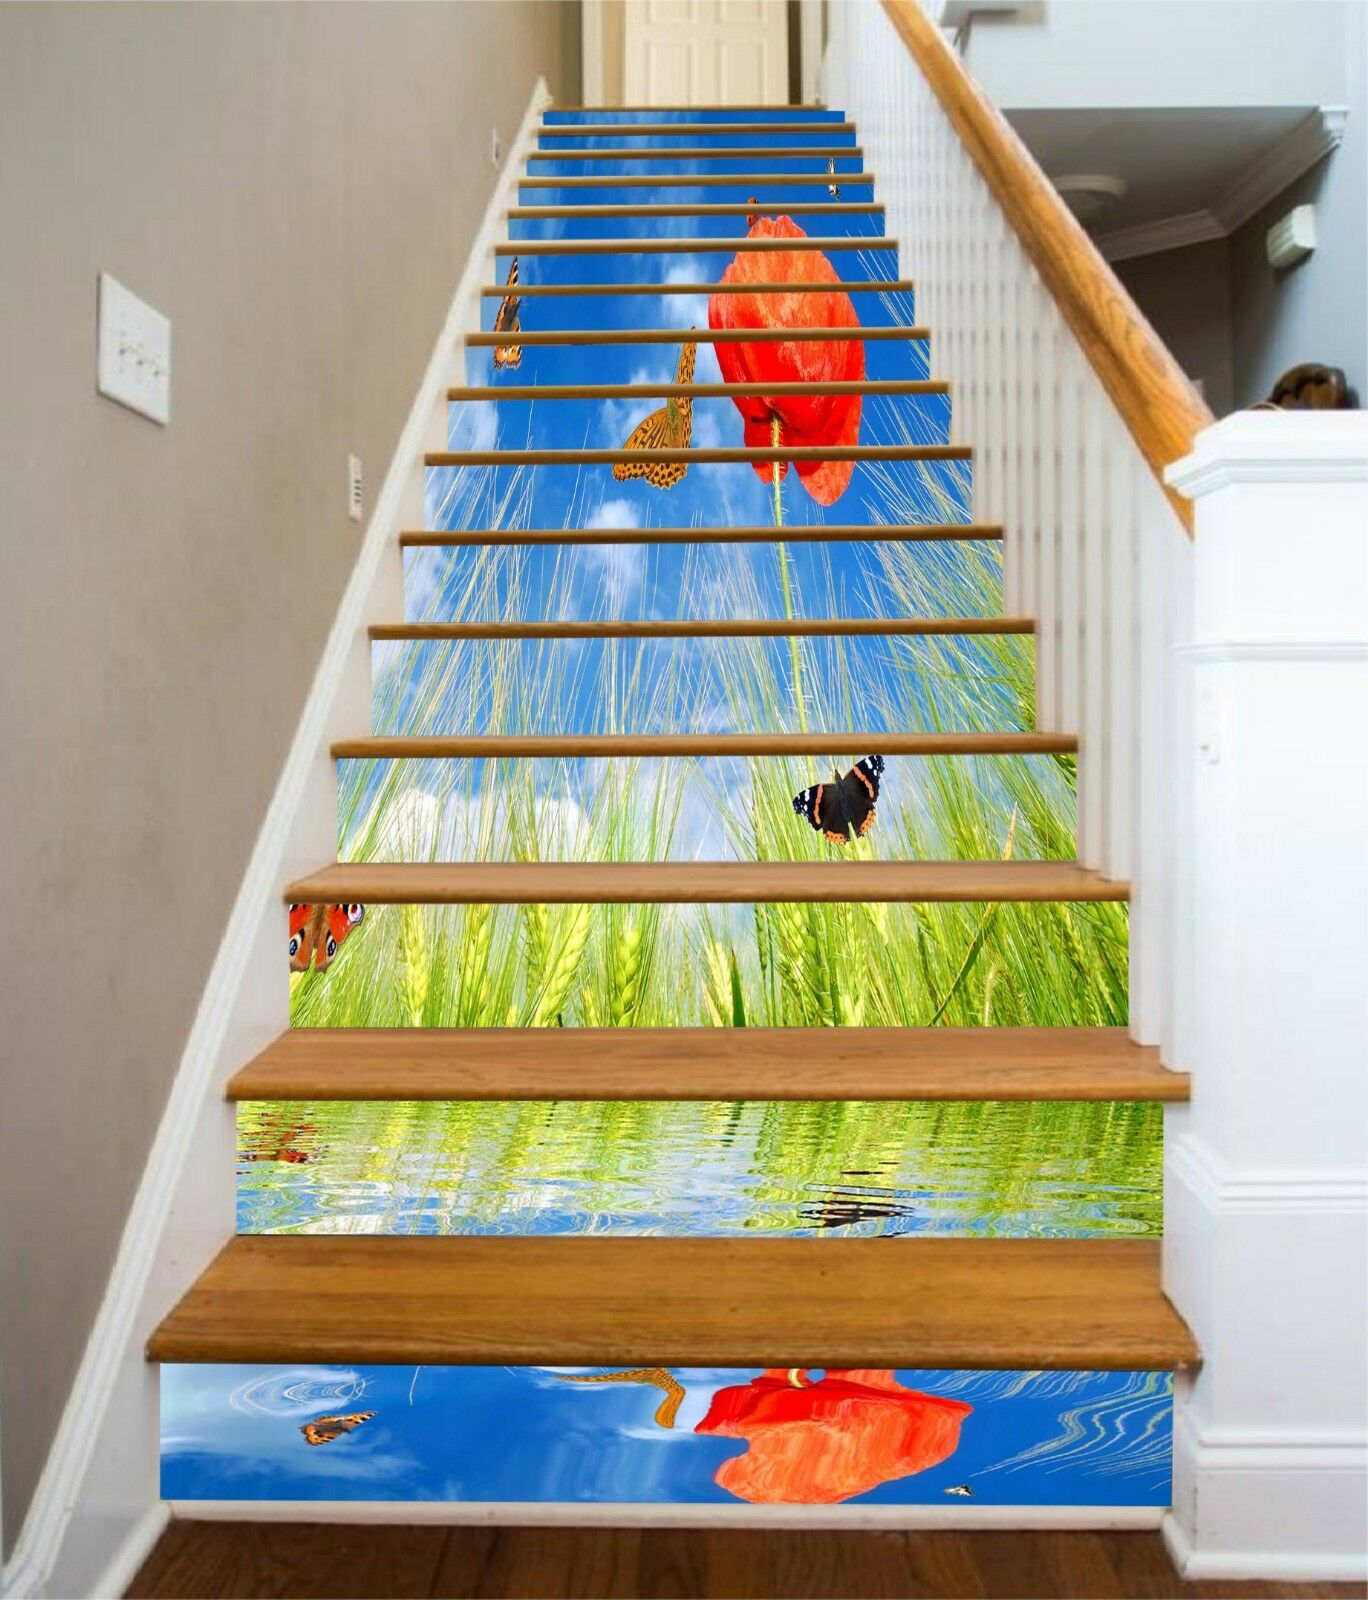 3D Wheat Flower Stair Risers Decoration Photo Mural Vinyl Decal Wallpaper CA